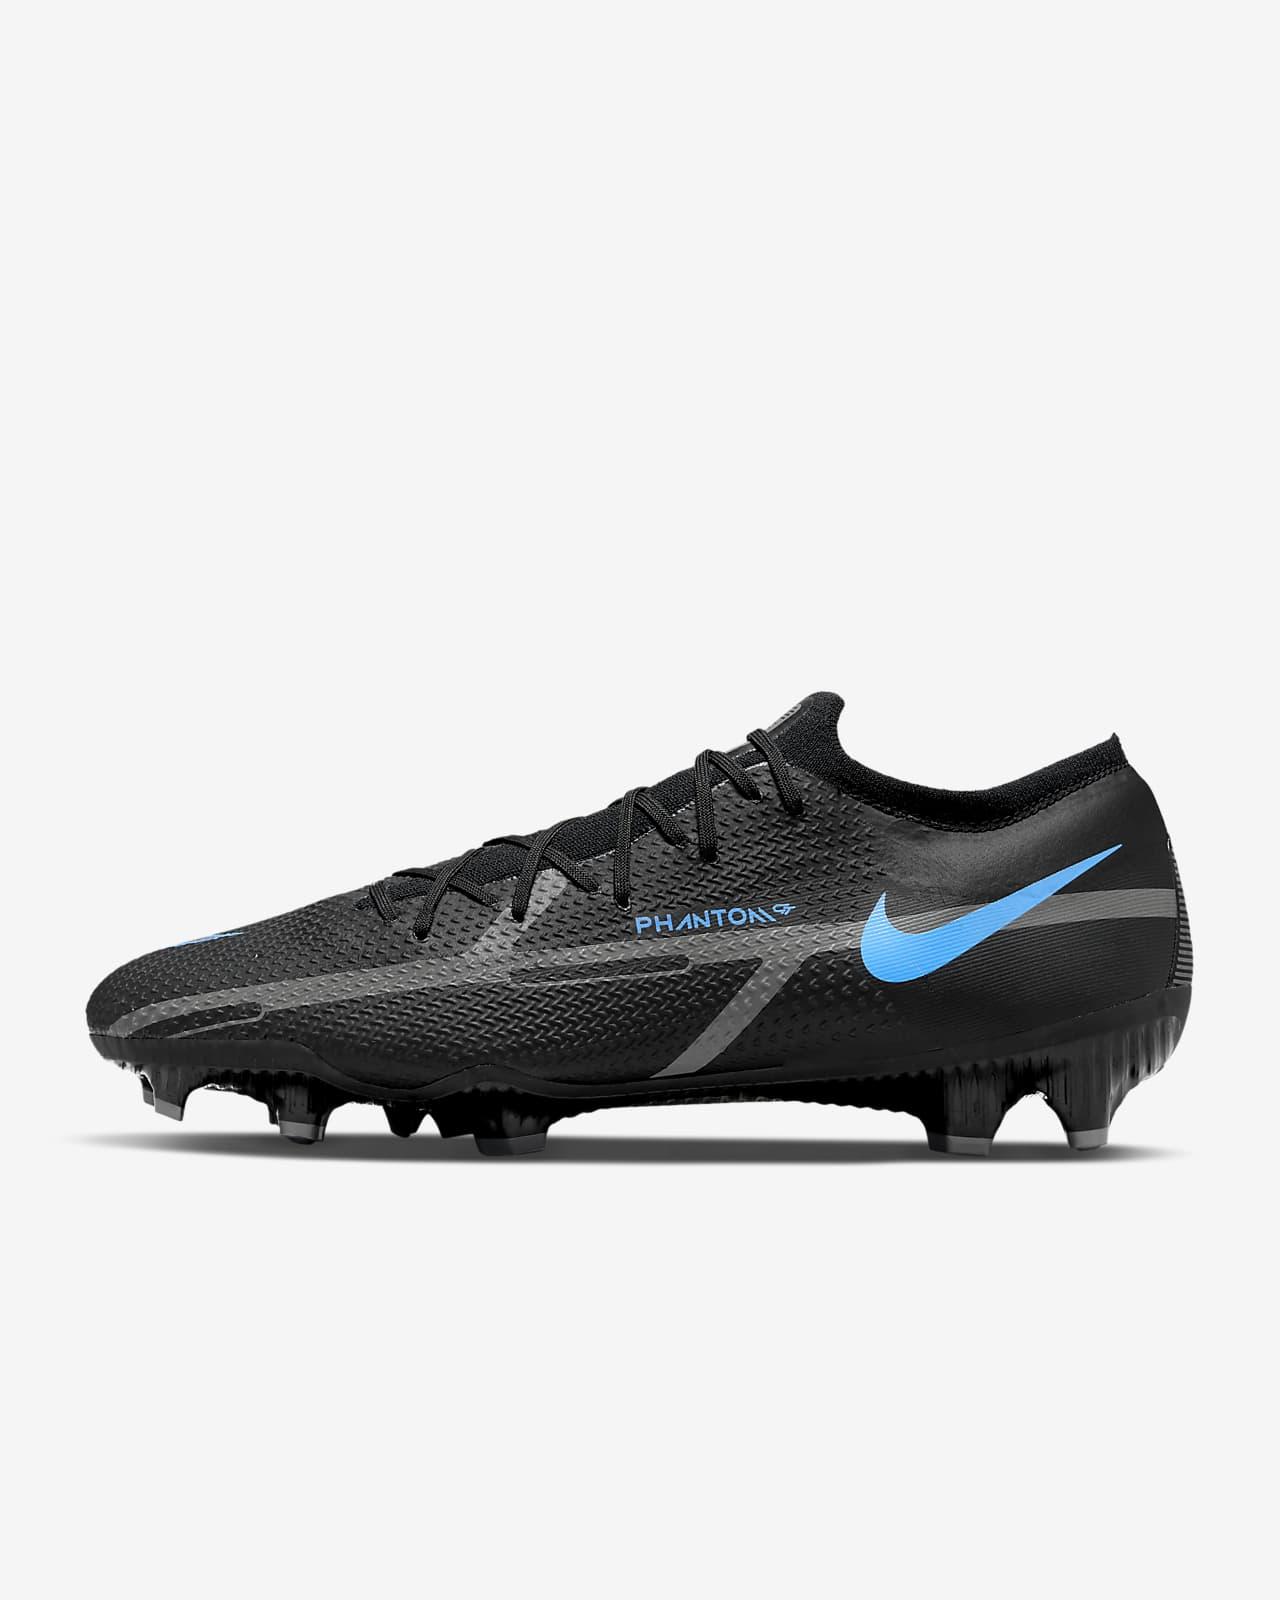 Chaussure de football à crampons pour terrain sec Nike Phantom GT2 ...